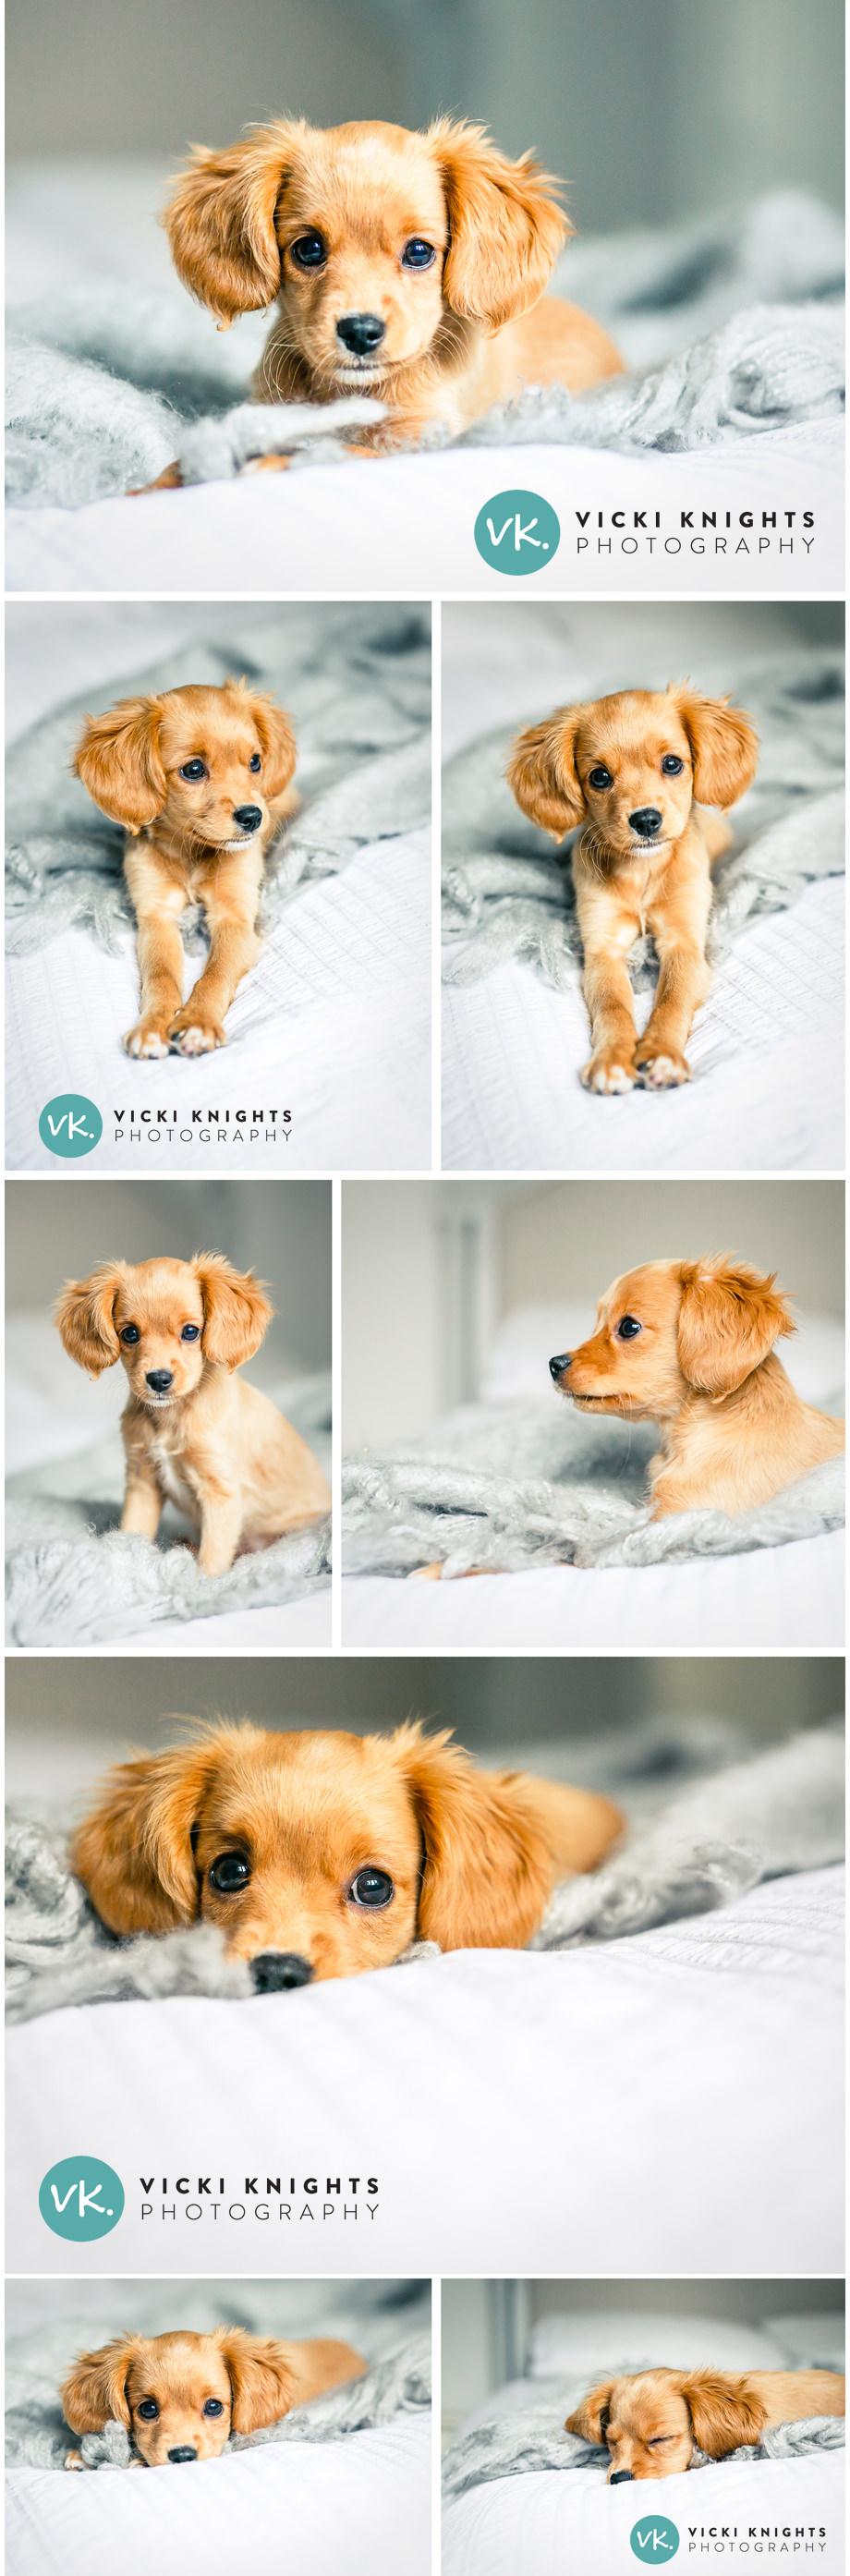 cavapoo-puppy-photography-vicki-knights